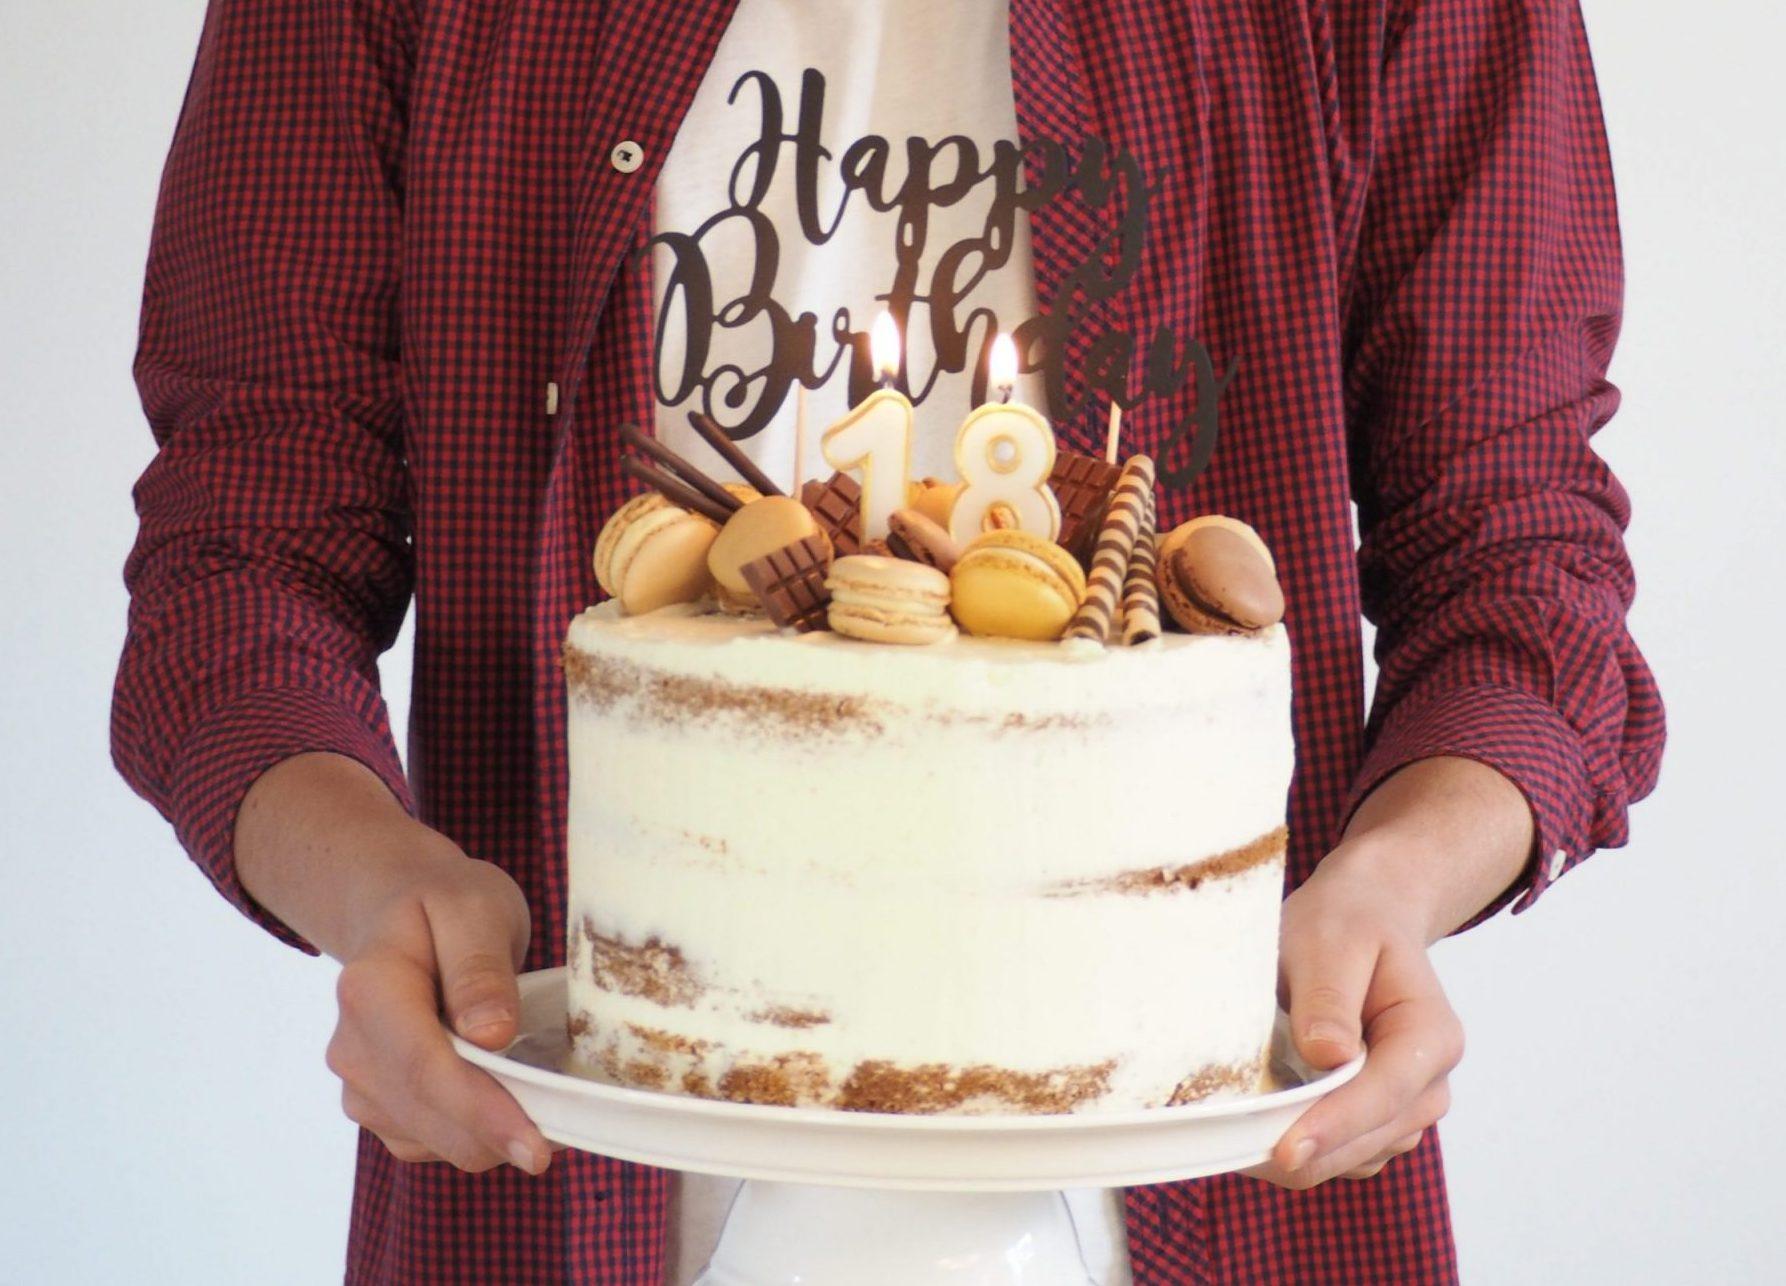 18. Geburtstag Semi Naked Cake